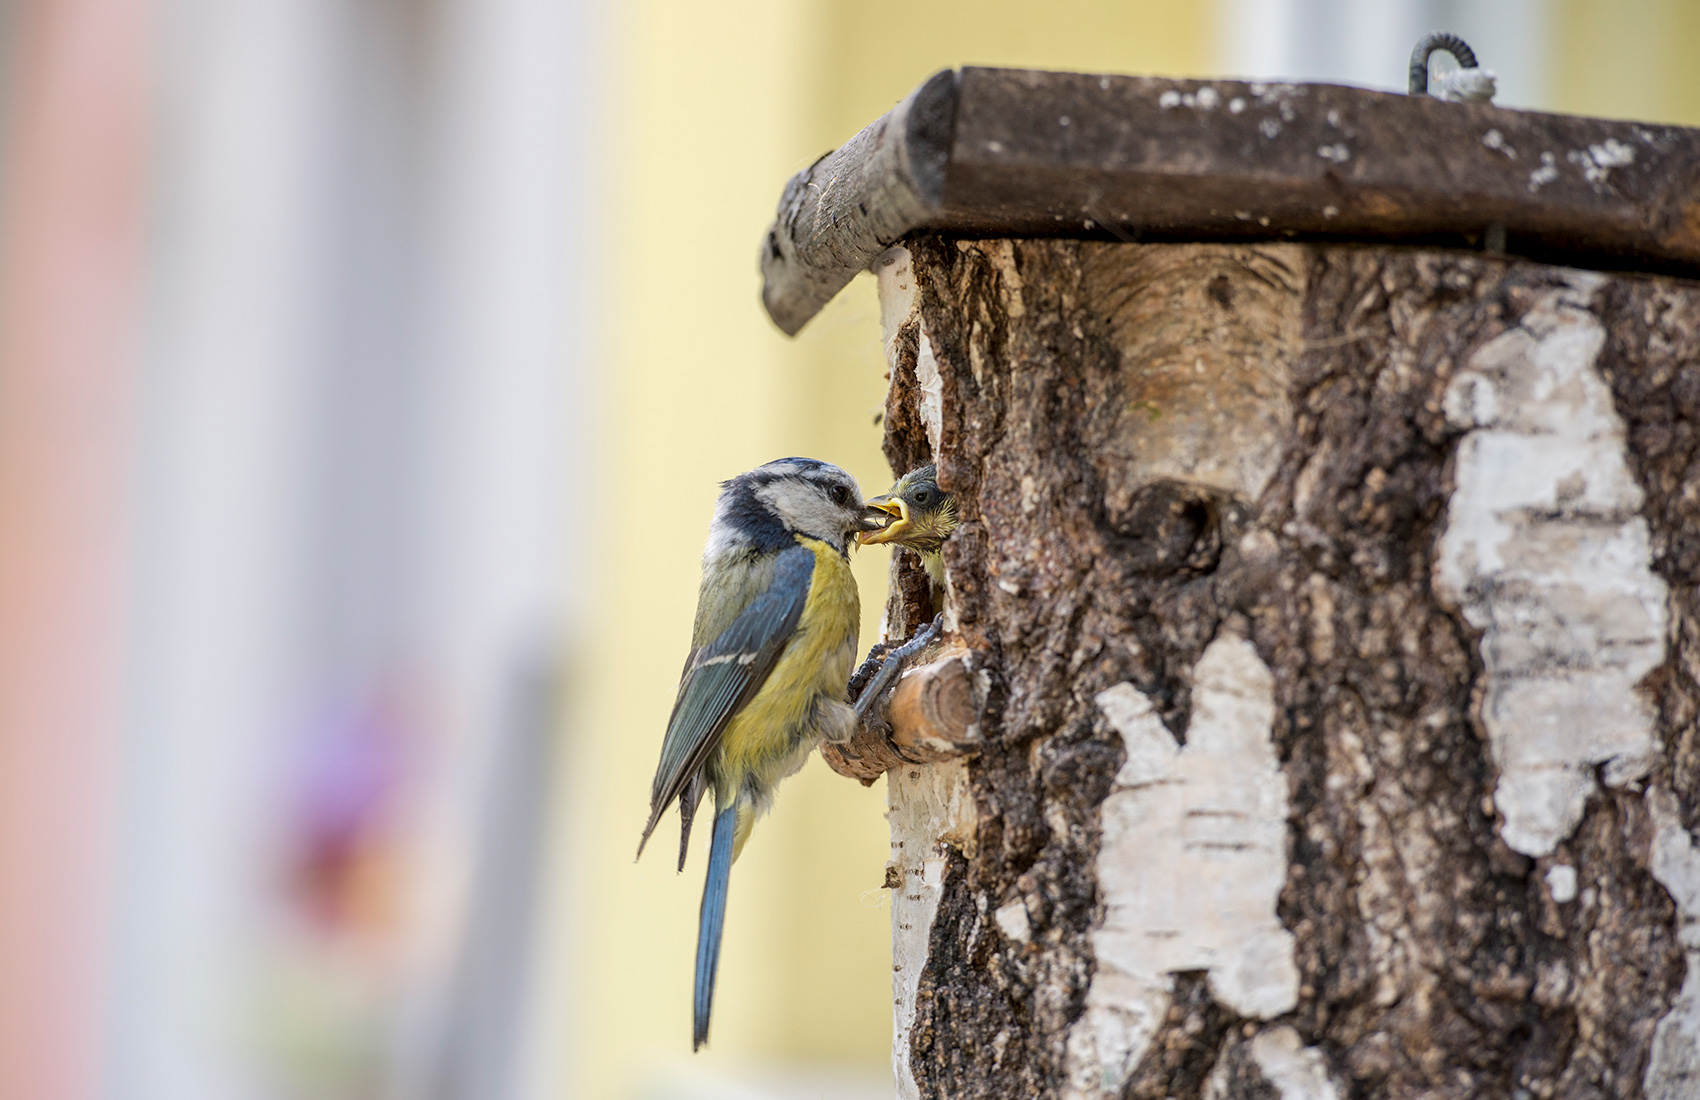 Blue Tit at Nesting Box